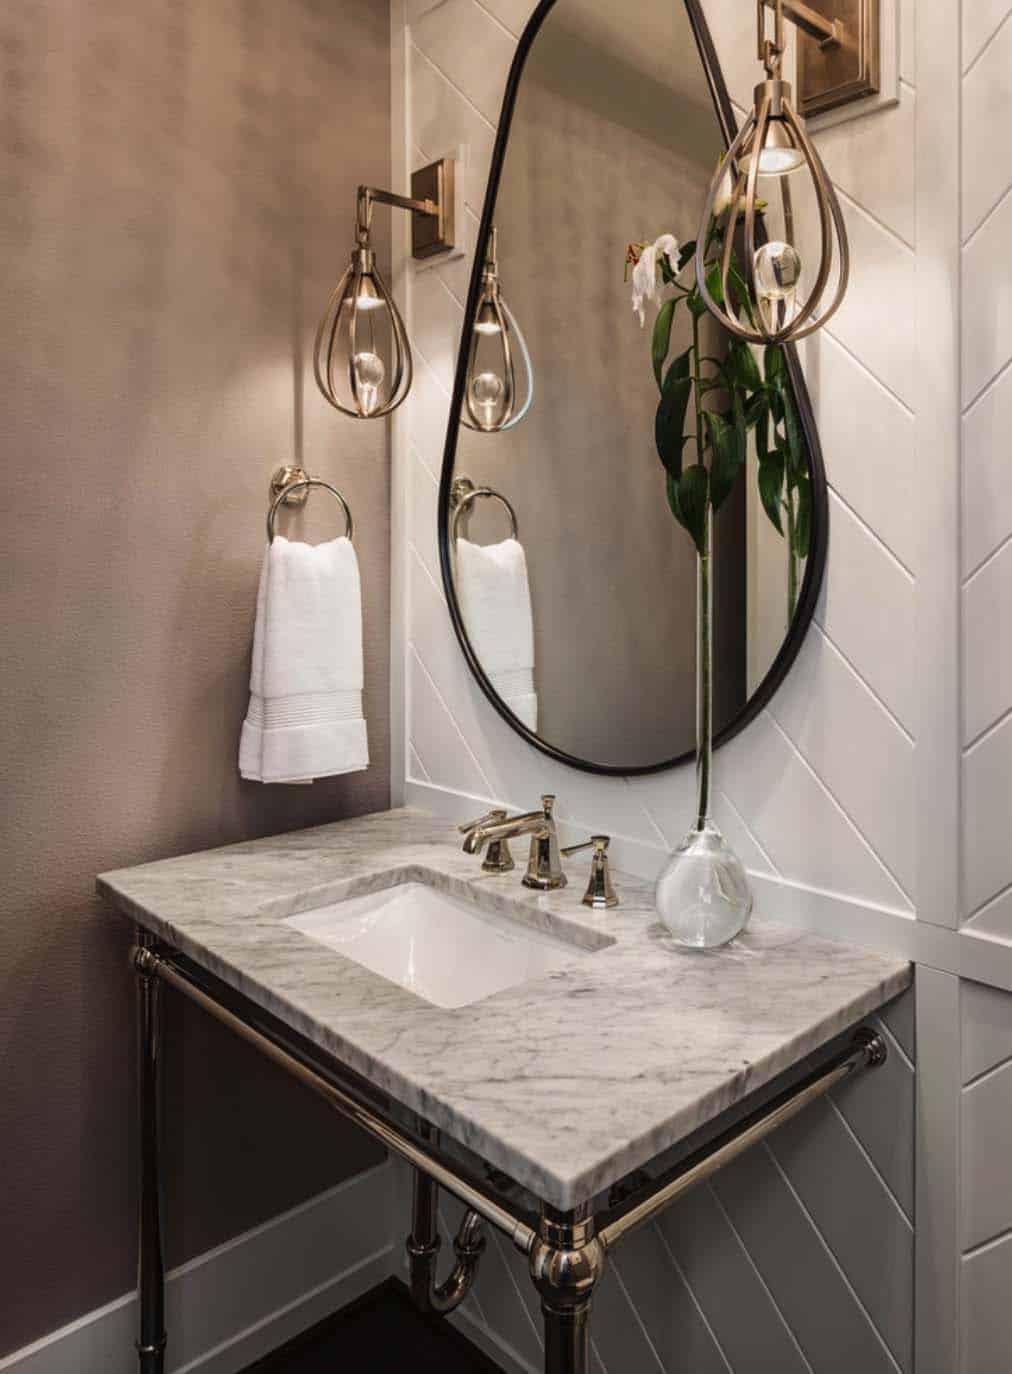 salle-de-bain-de-transition-francaise